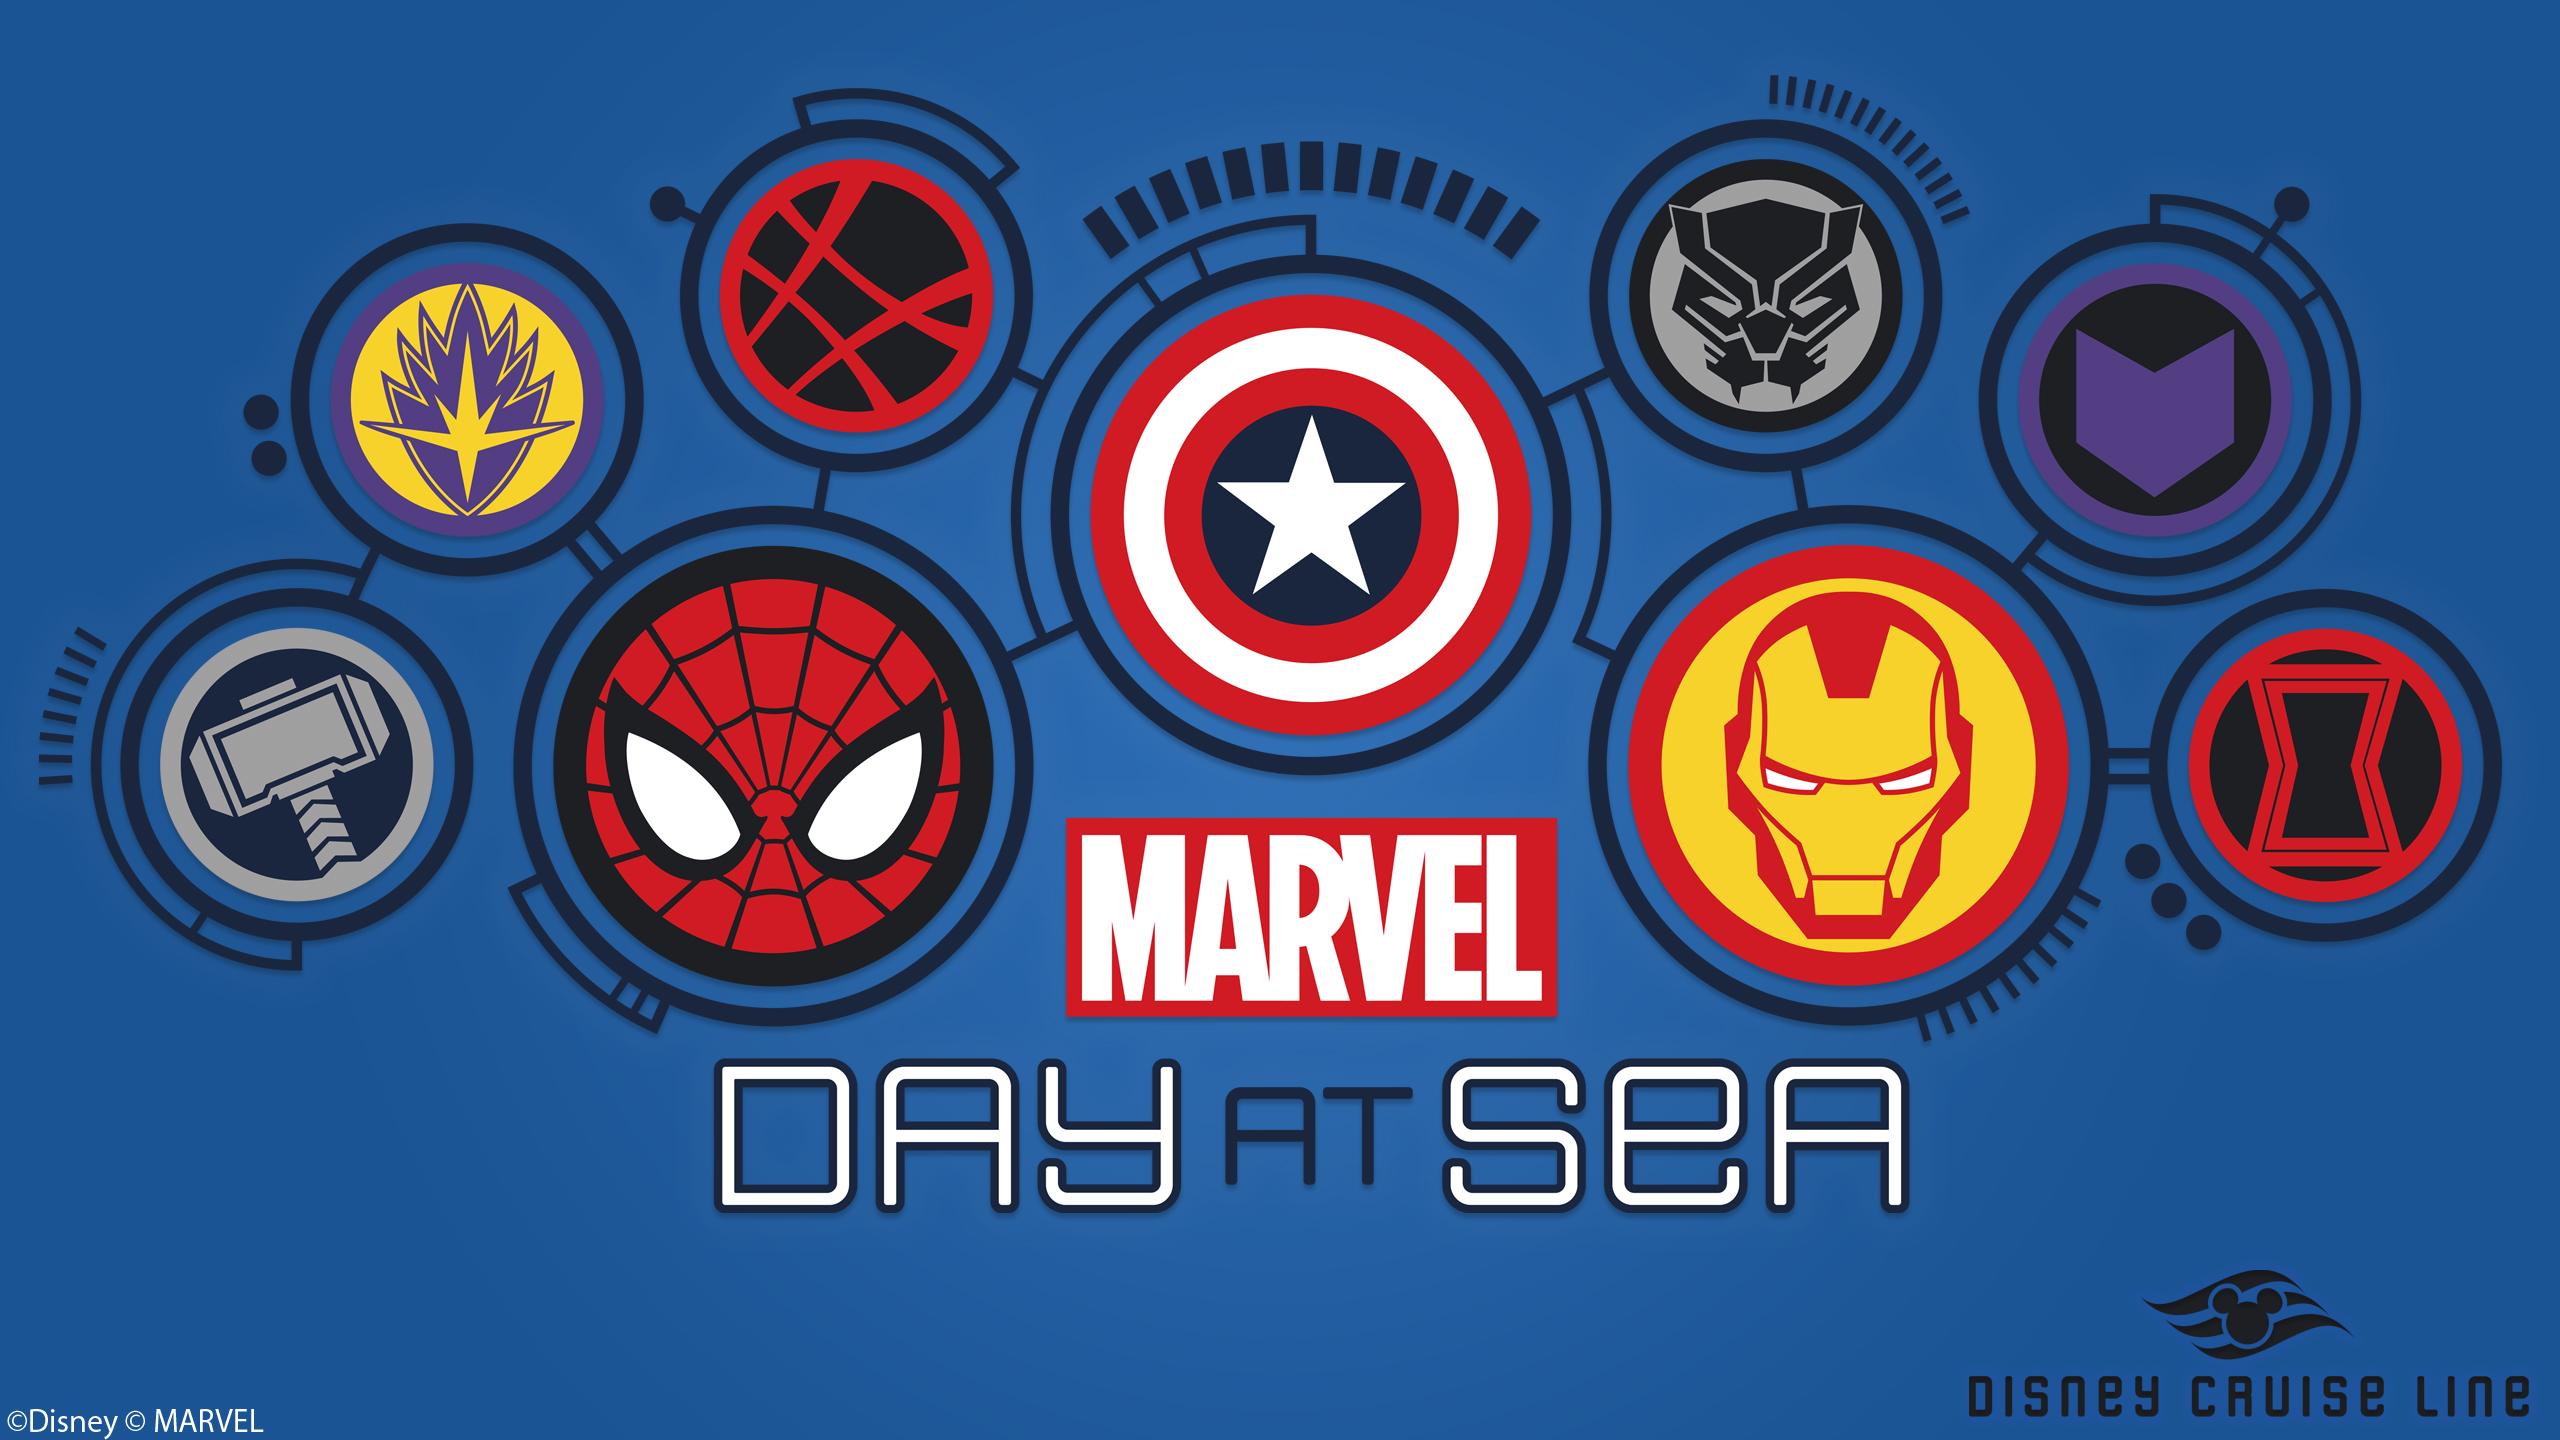 Best Wallpaper Marvel Halloween - MDAS_2560x1440  Gallery_338411.jpg